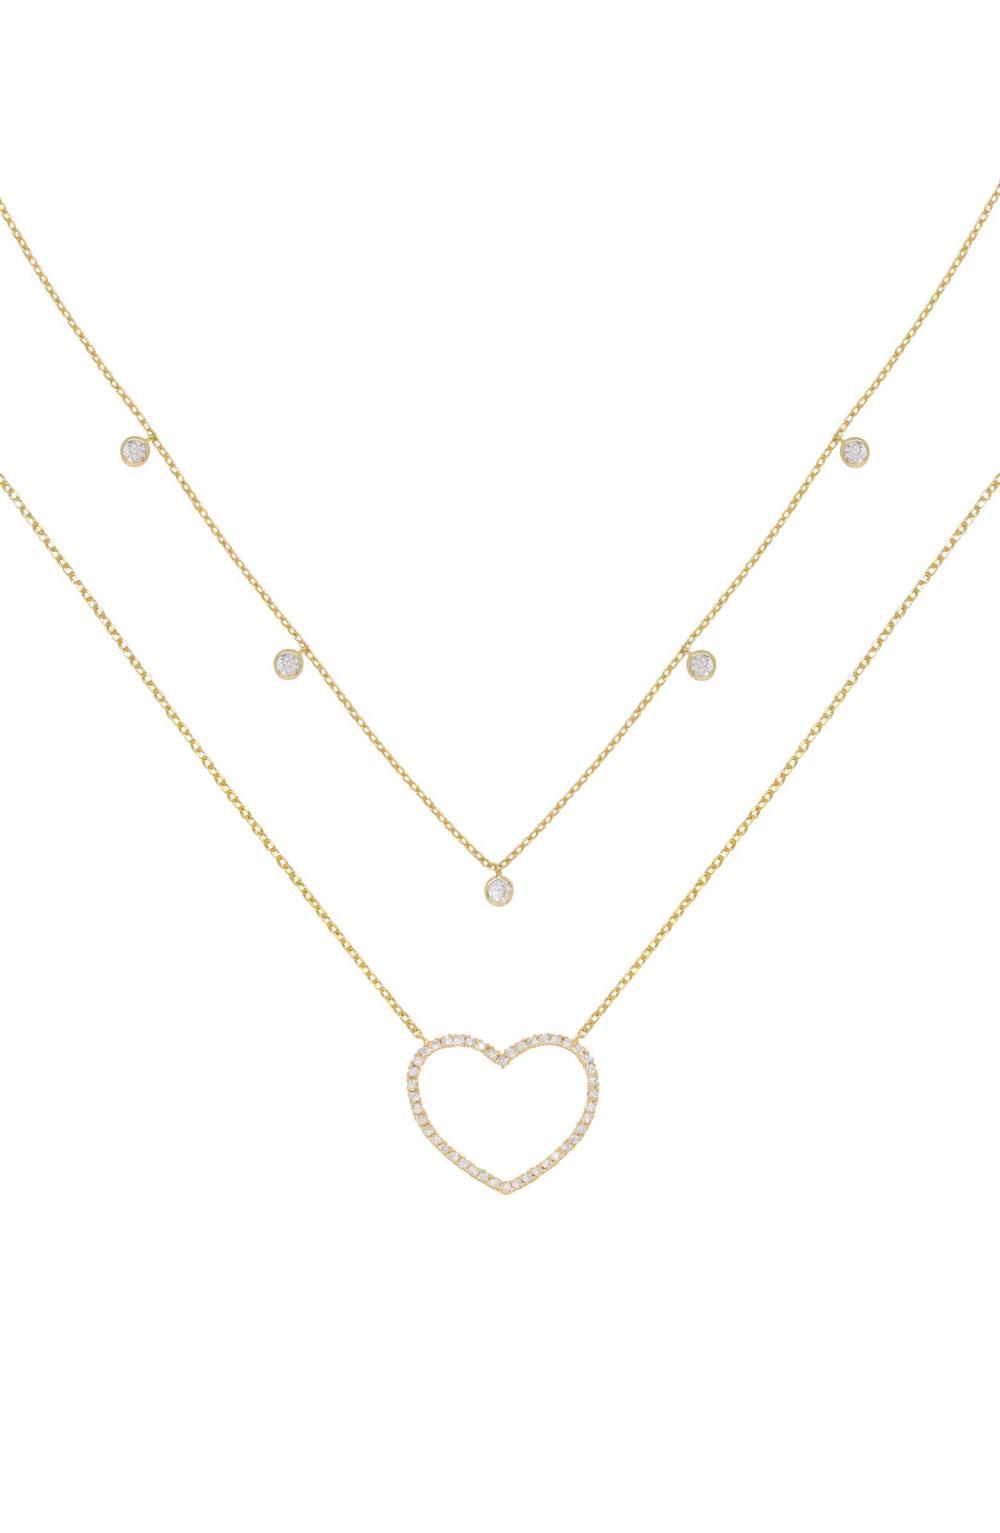 Dainty Heart Set of 2 Pendant Necklaces